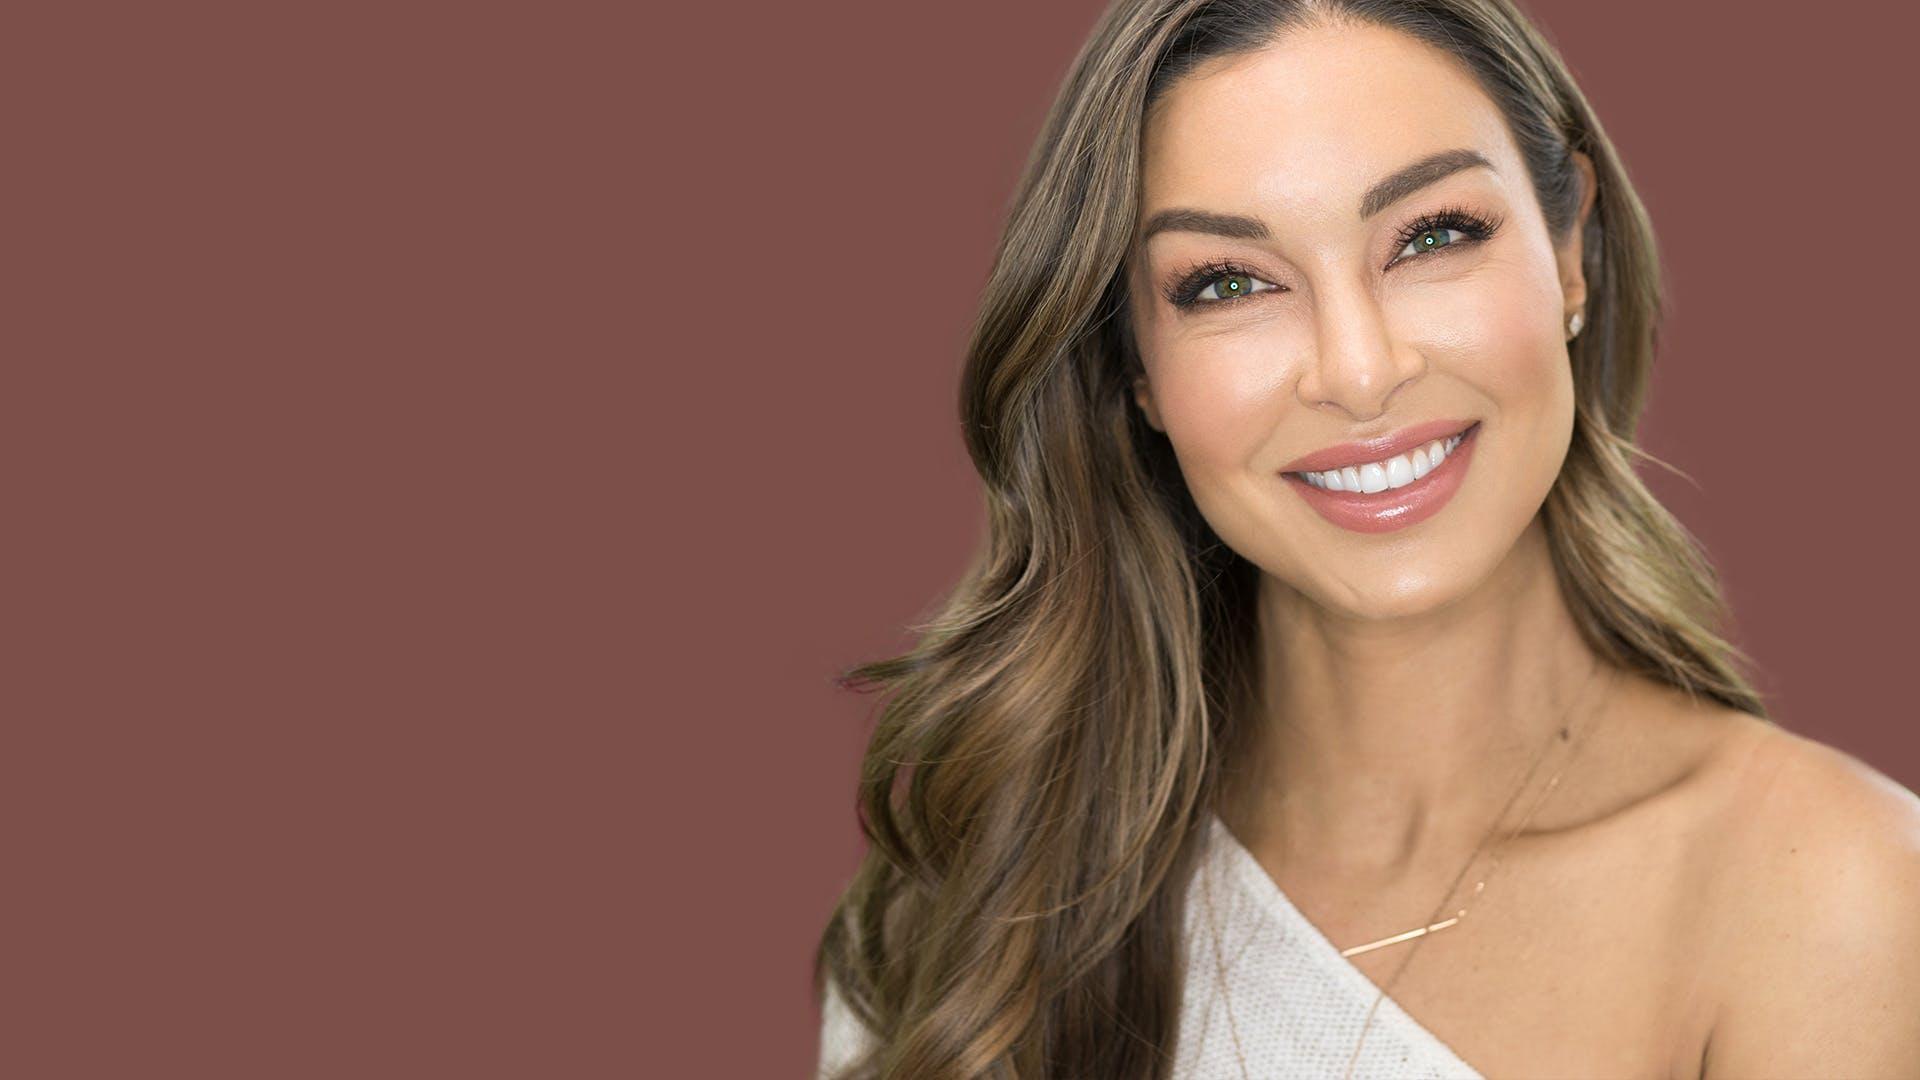 Laurina Fleur Australian model after teeth whitening treatment.